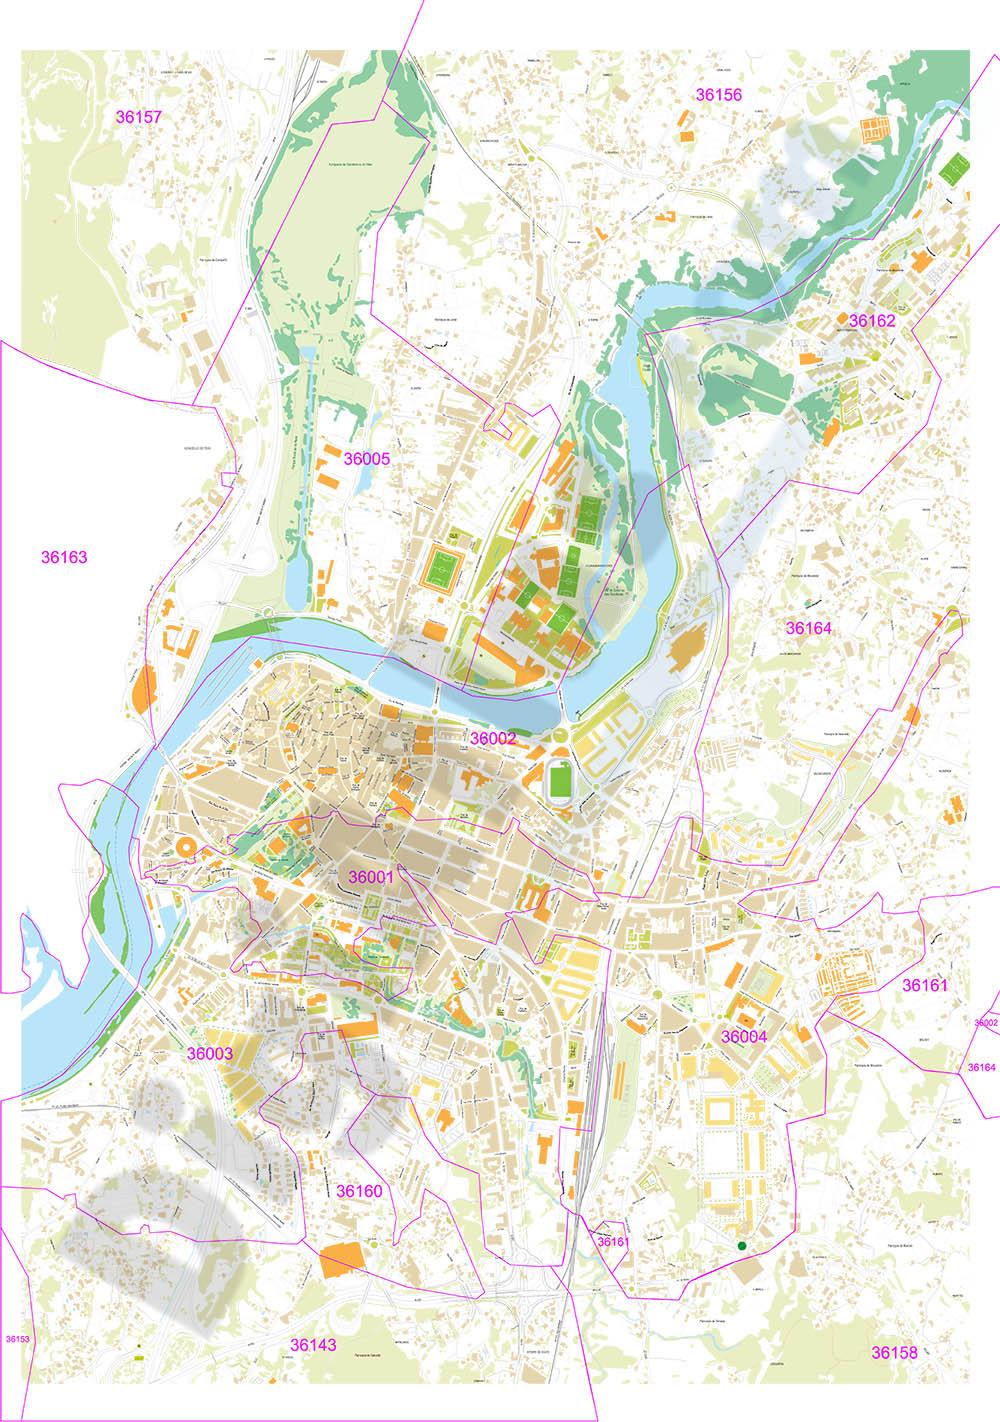 Pontevedra (Galicia, Spain) - city map with postal codes